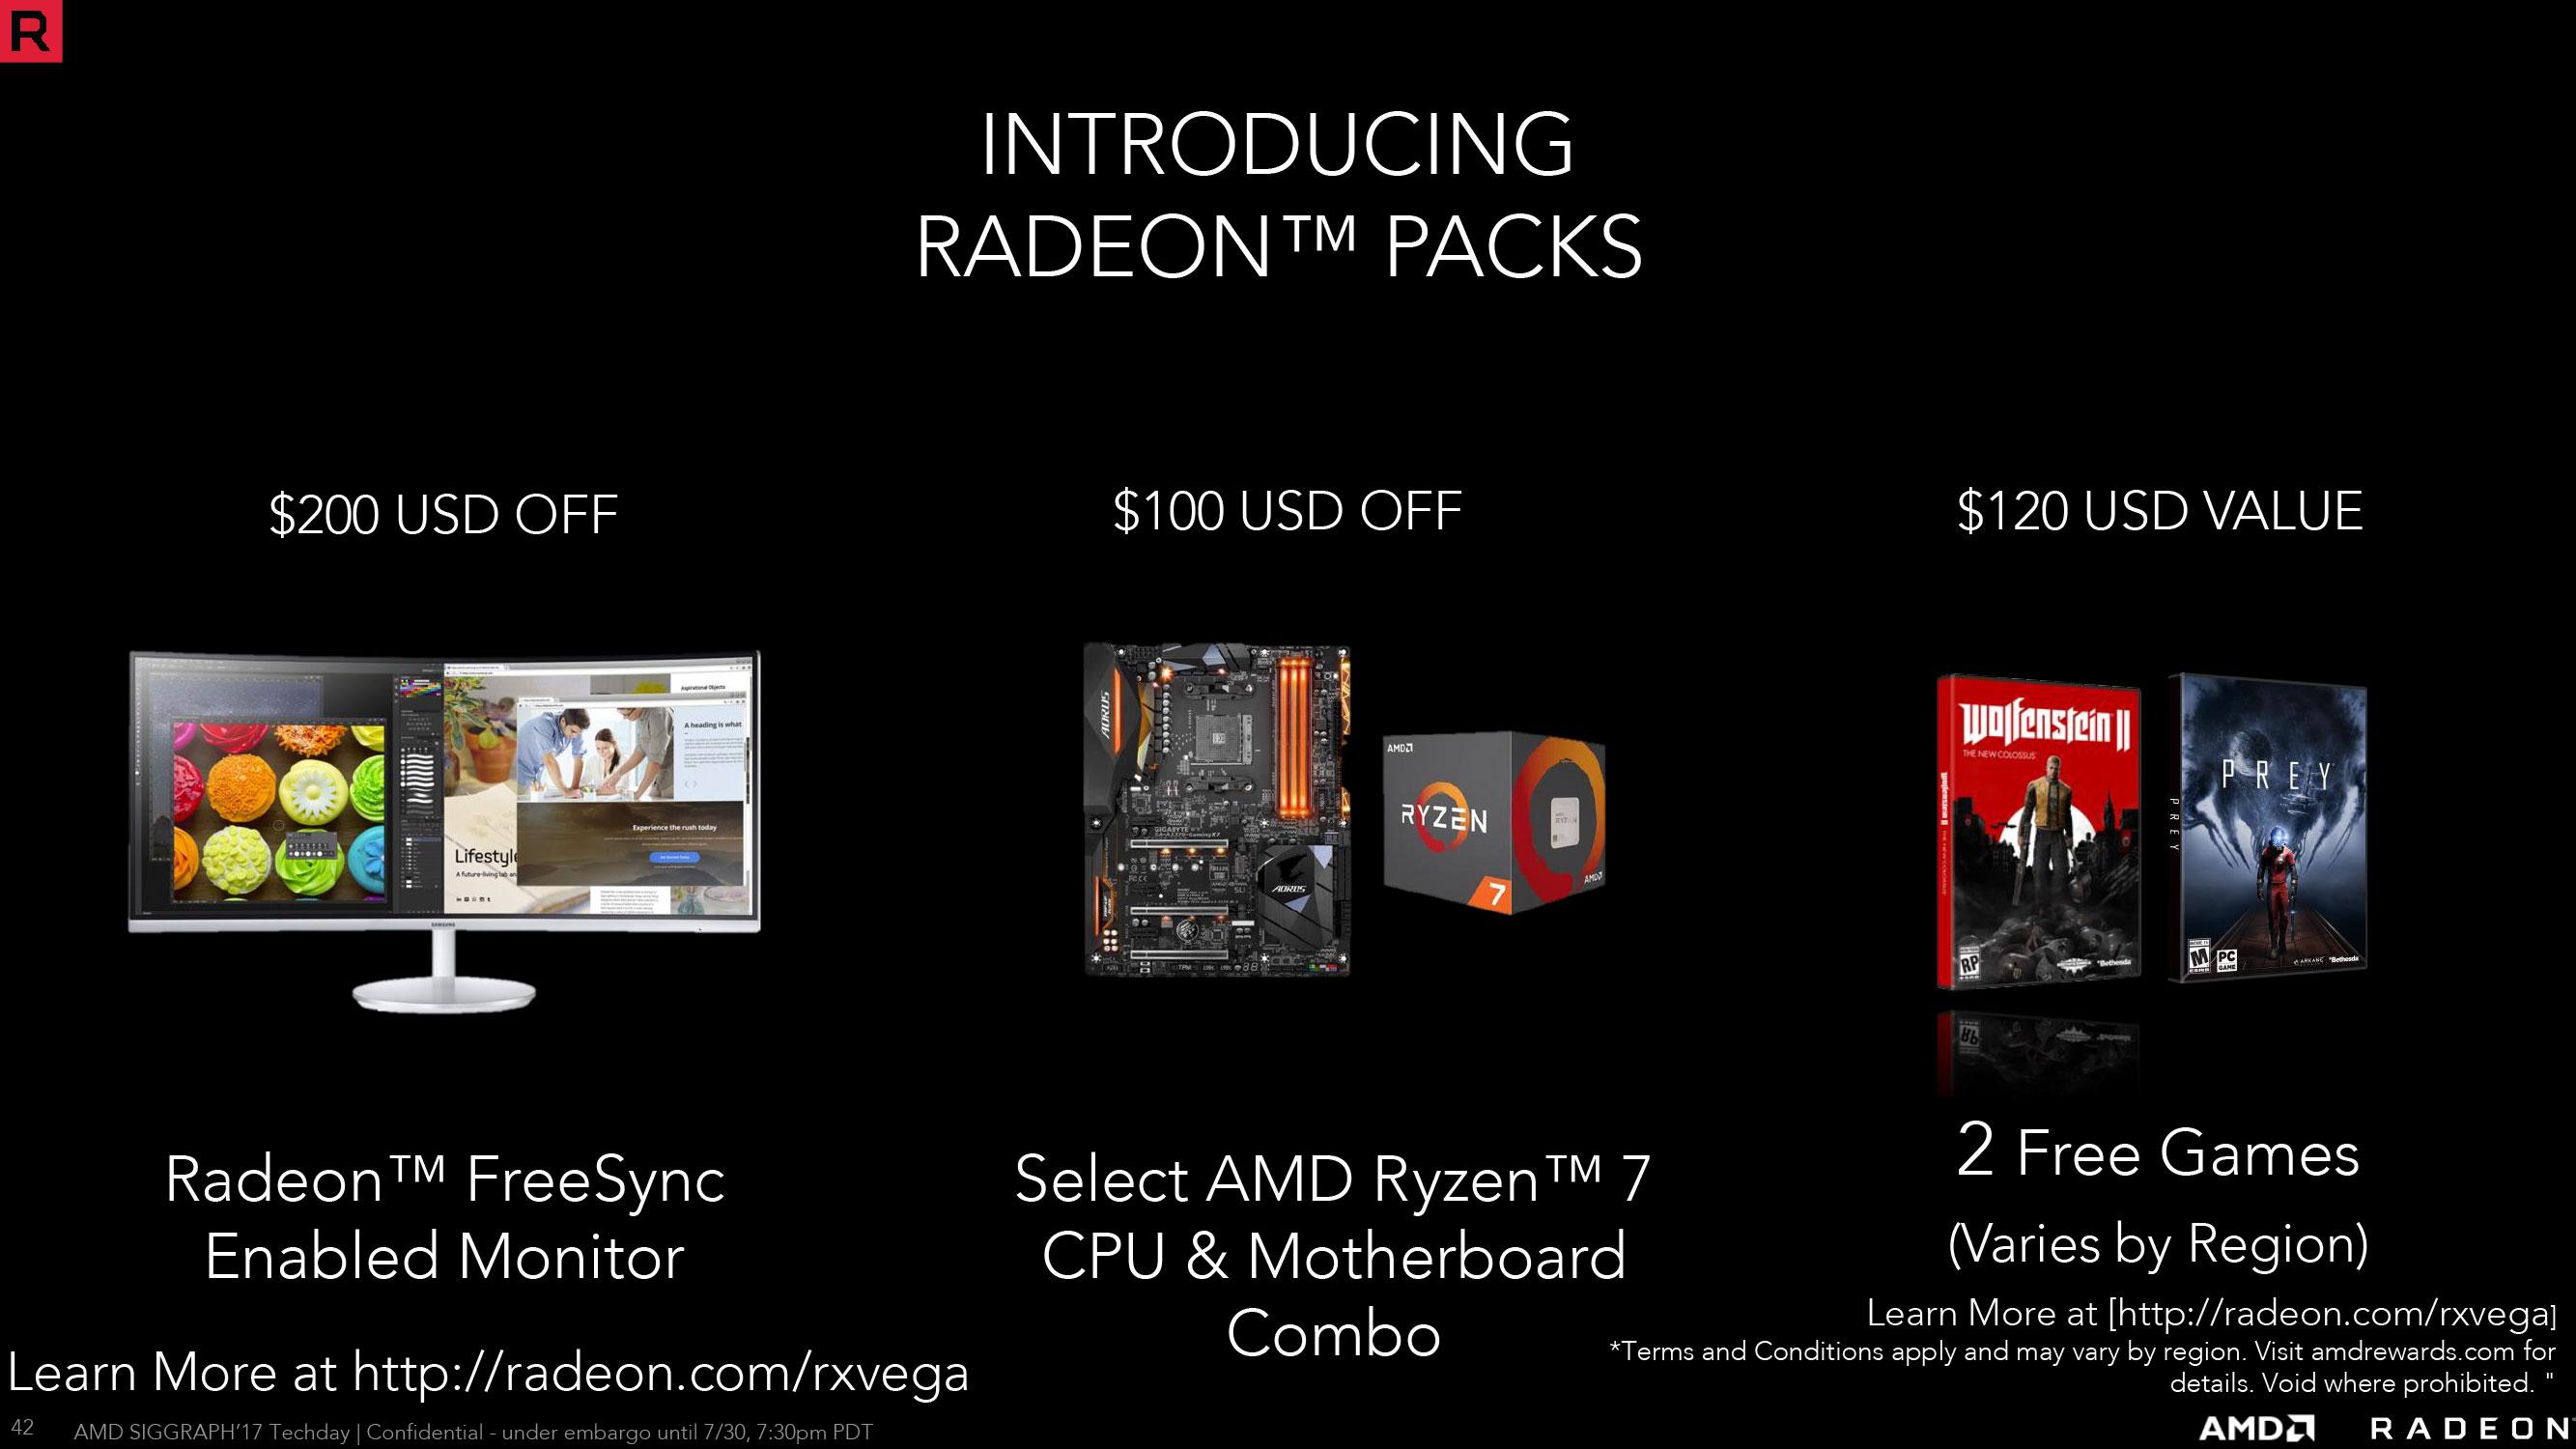 The AMD Radeon RX Vega Review: Vega 64, Vega 64 Liquid, Vega